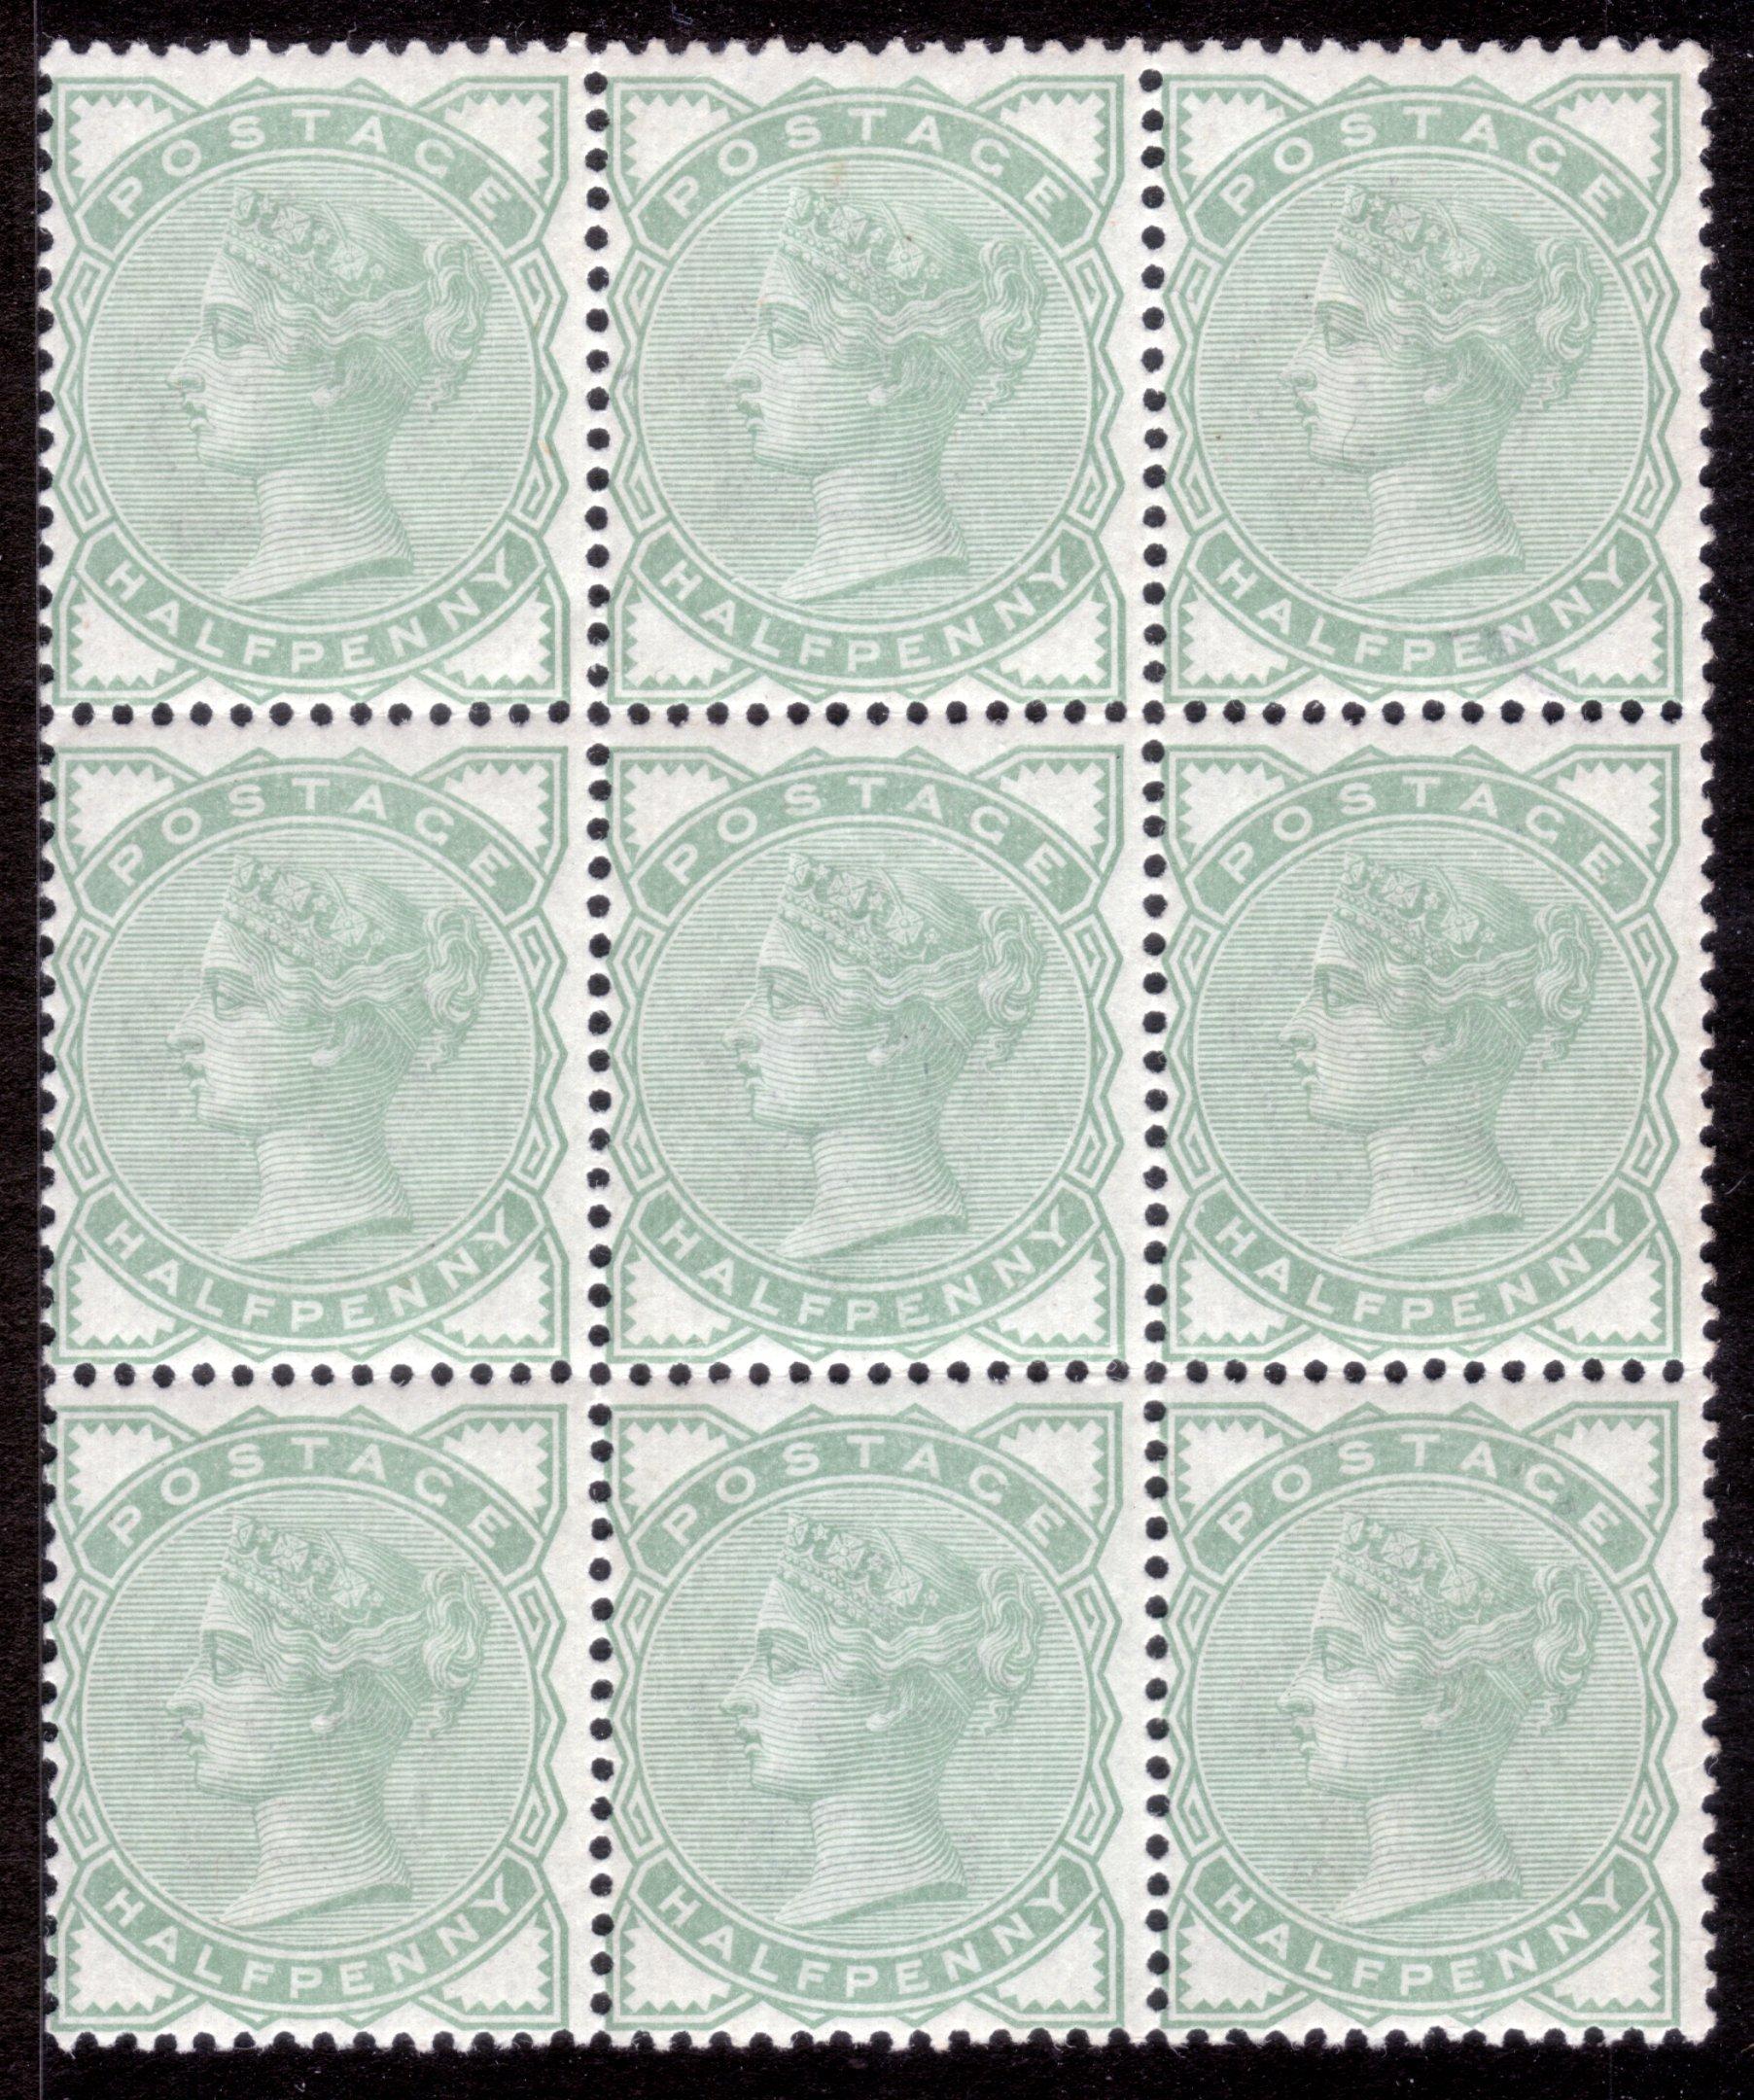 1880 ½d Pale Green Mint Block Nine